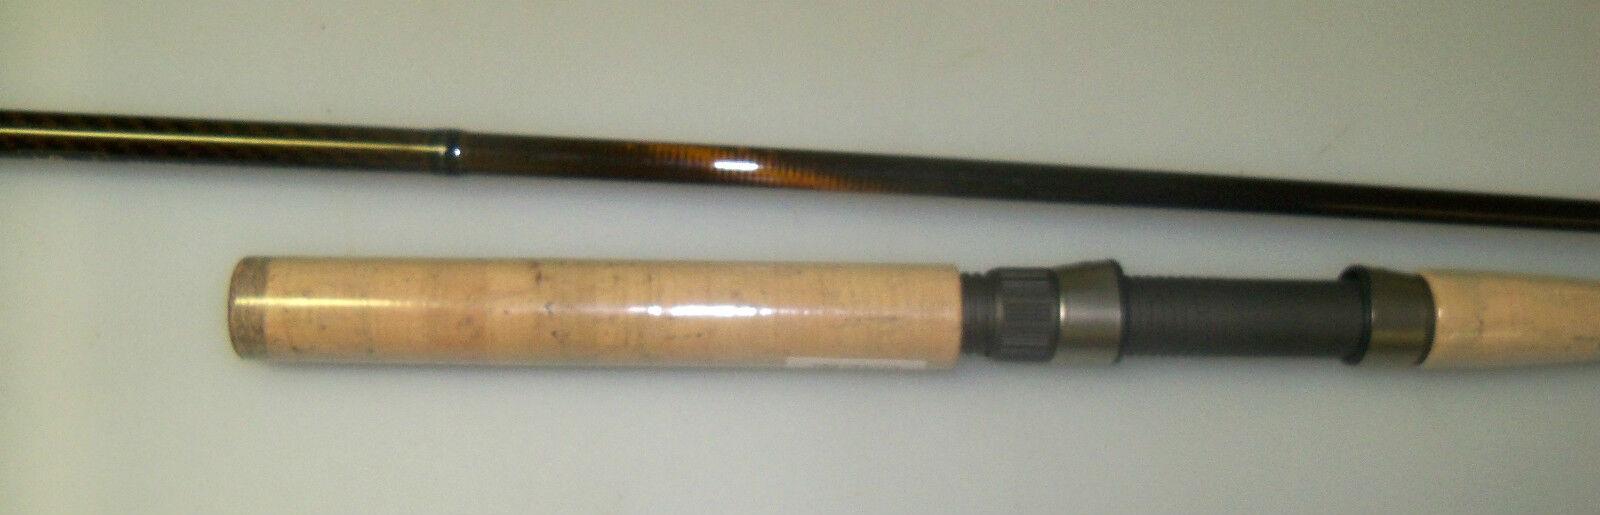 7' 6  8-17 lb EUPRO IM-8 GRAPHITE SPINNING FISHING ROD - PROFESSIONAL ROD